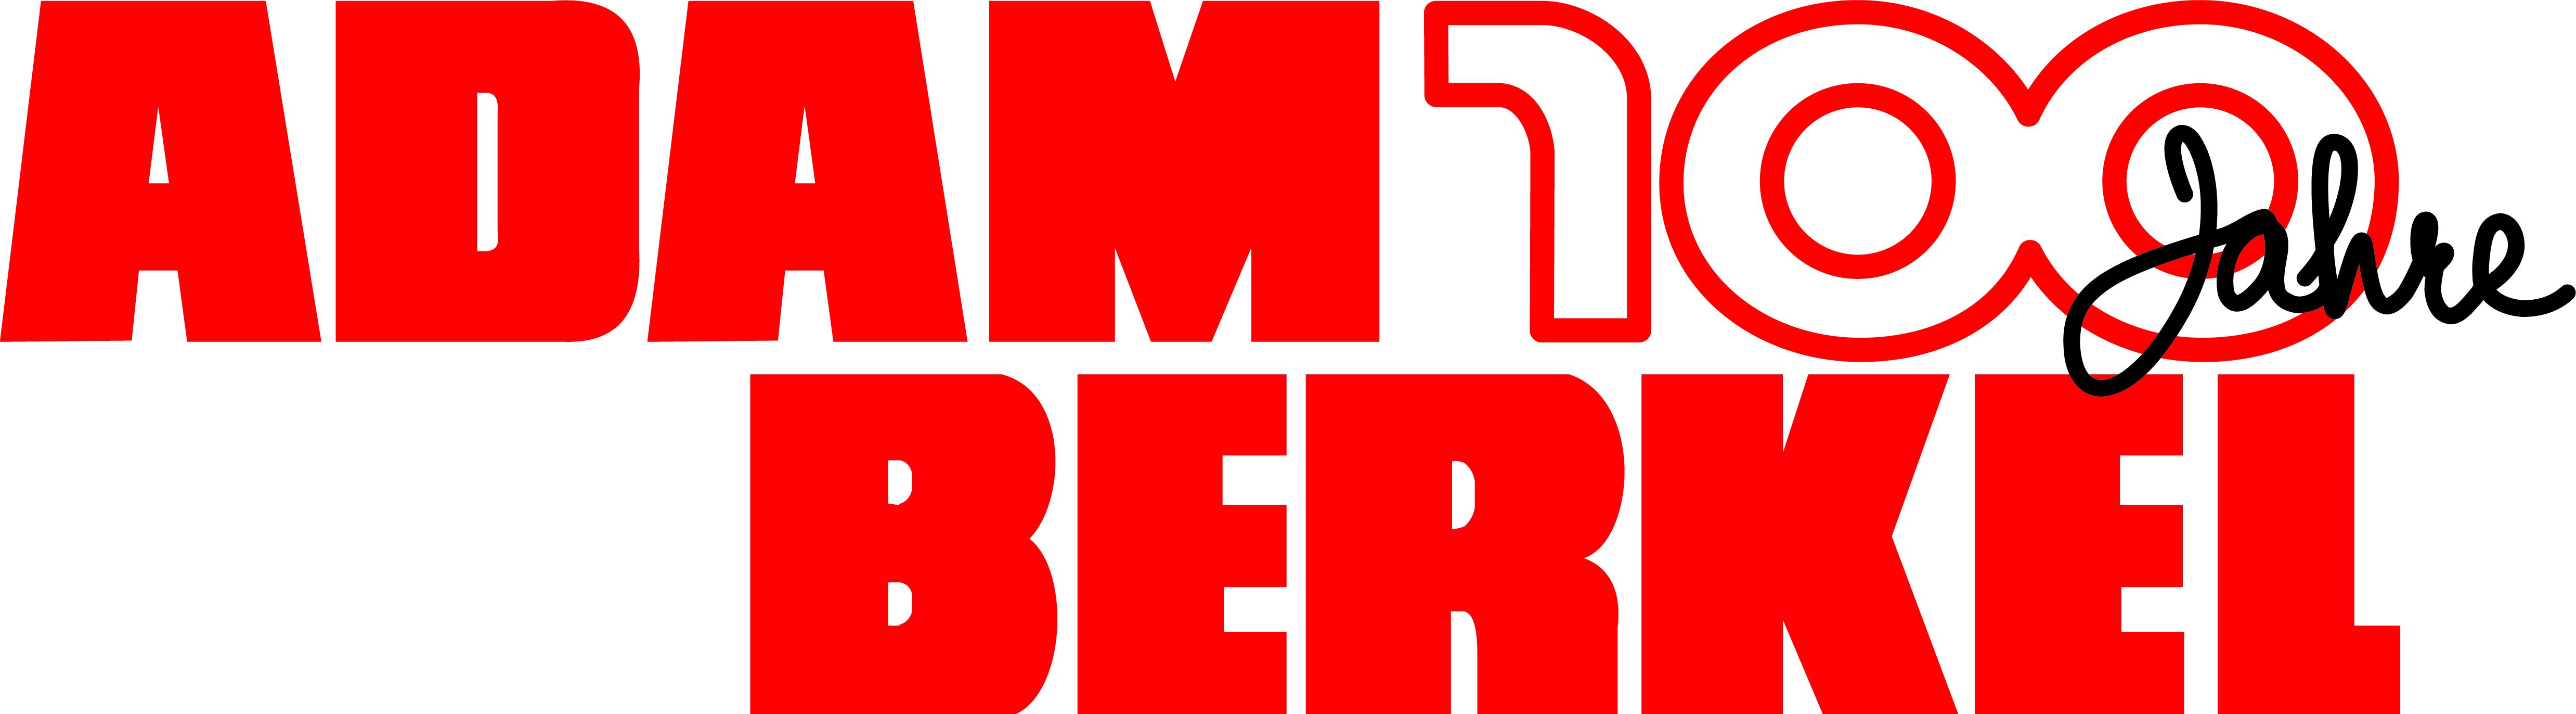 https://www.schoell.com/wp-content/uploads/Logo_Berkel_100_Jahre.jpg